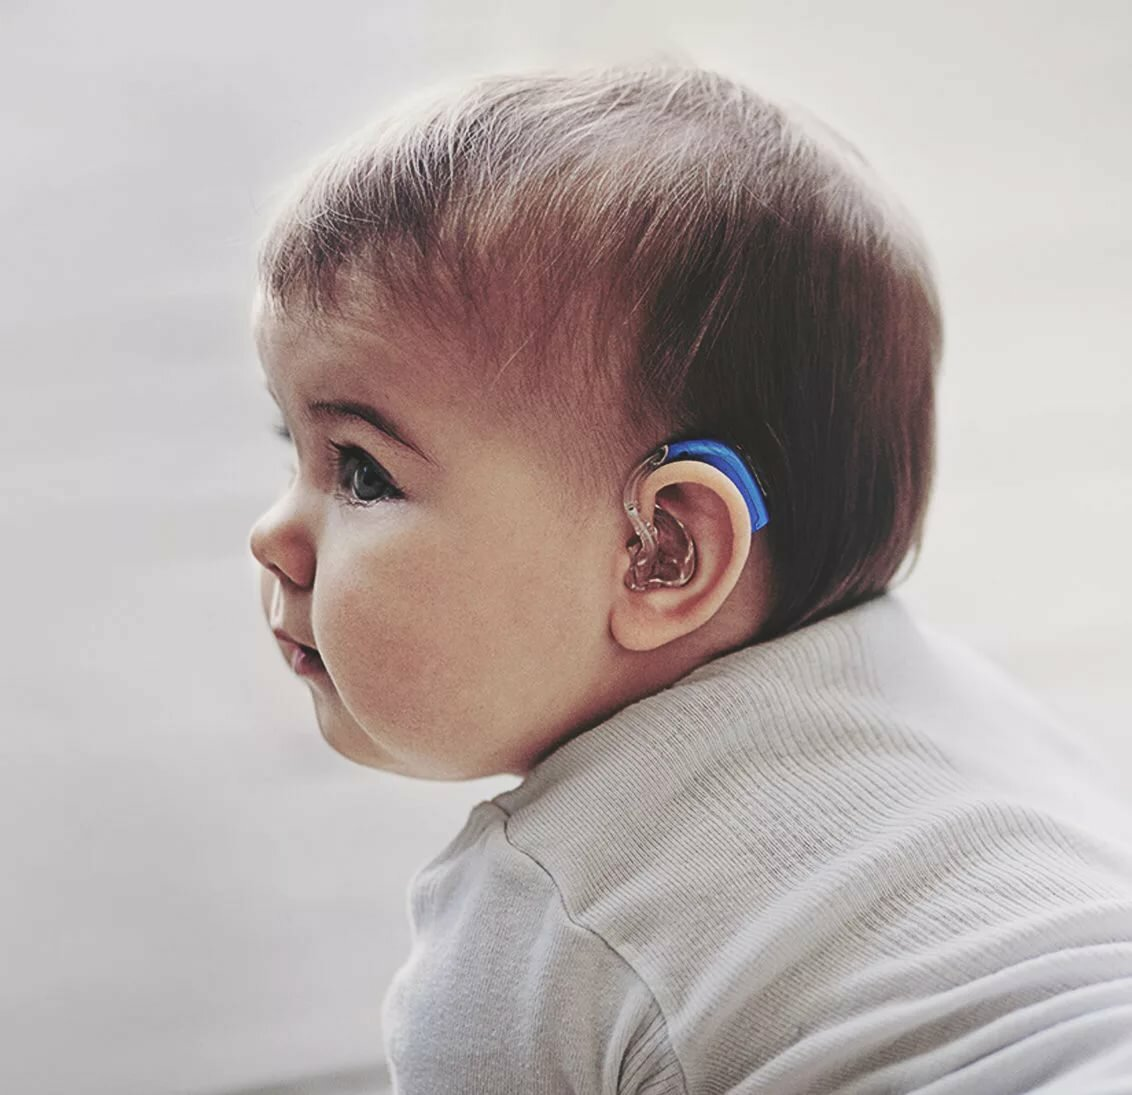 Дети с нарушение слуха картинки